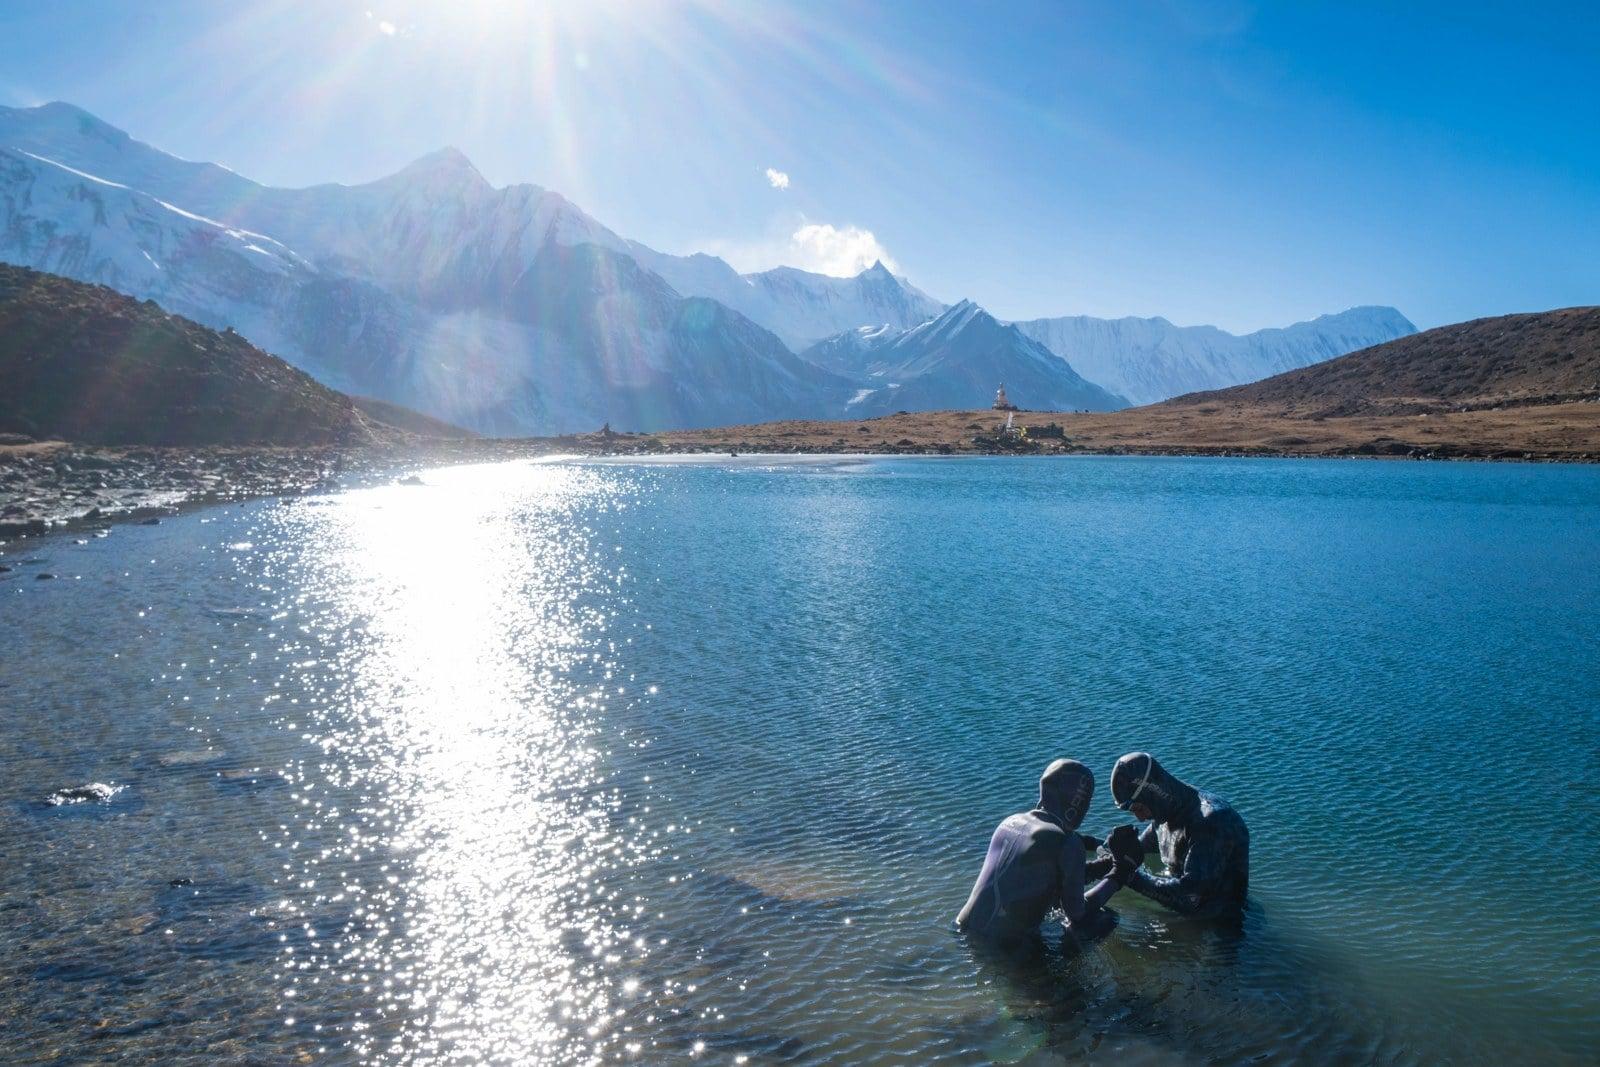 Himalaya 2017 – Extreme Altitude Freedive Project